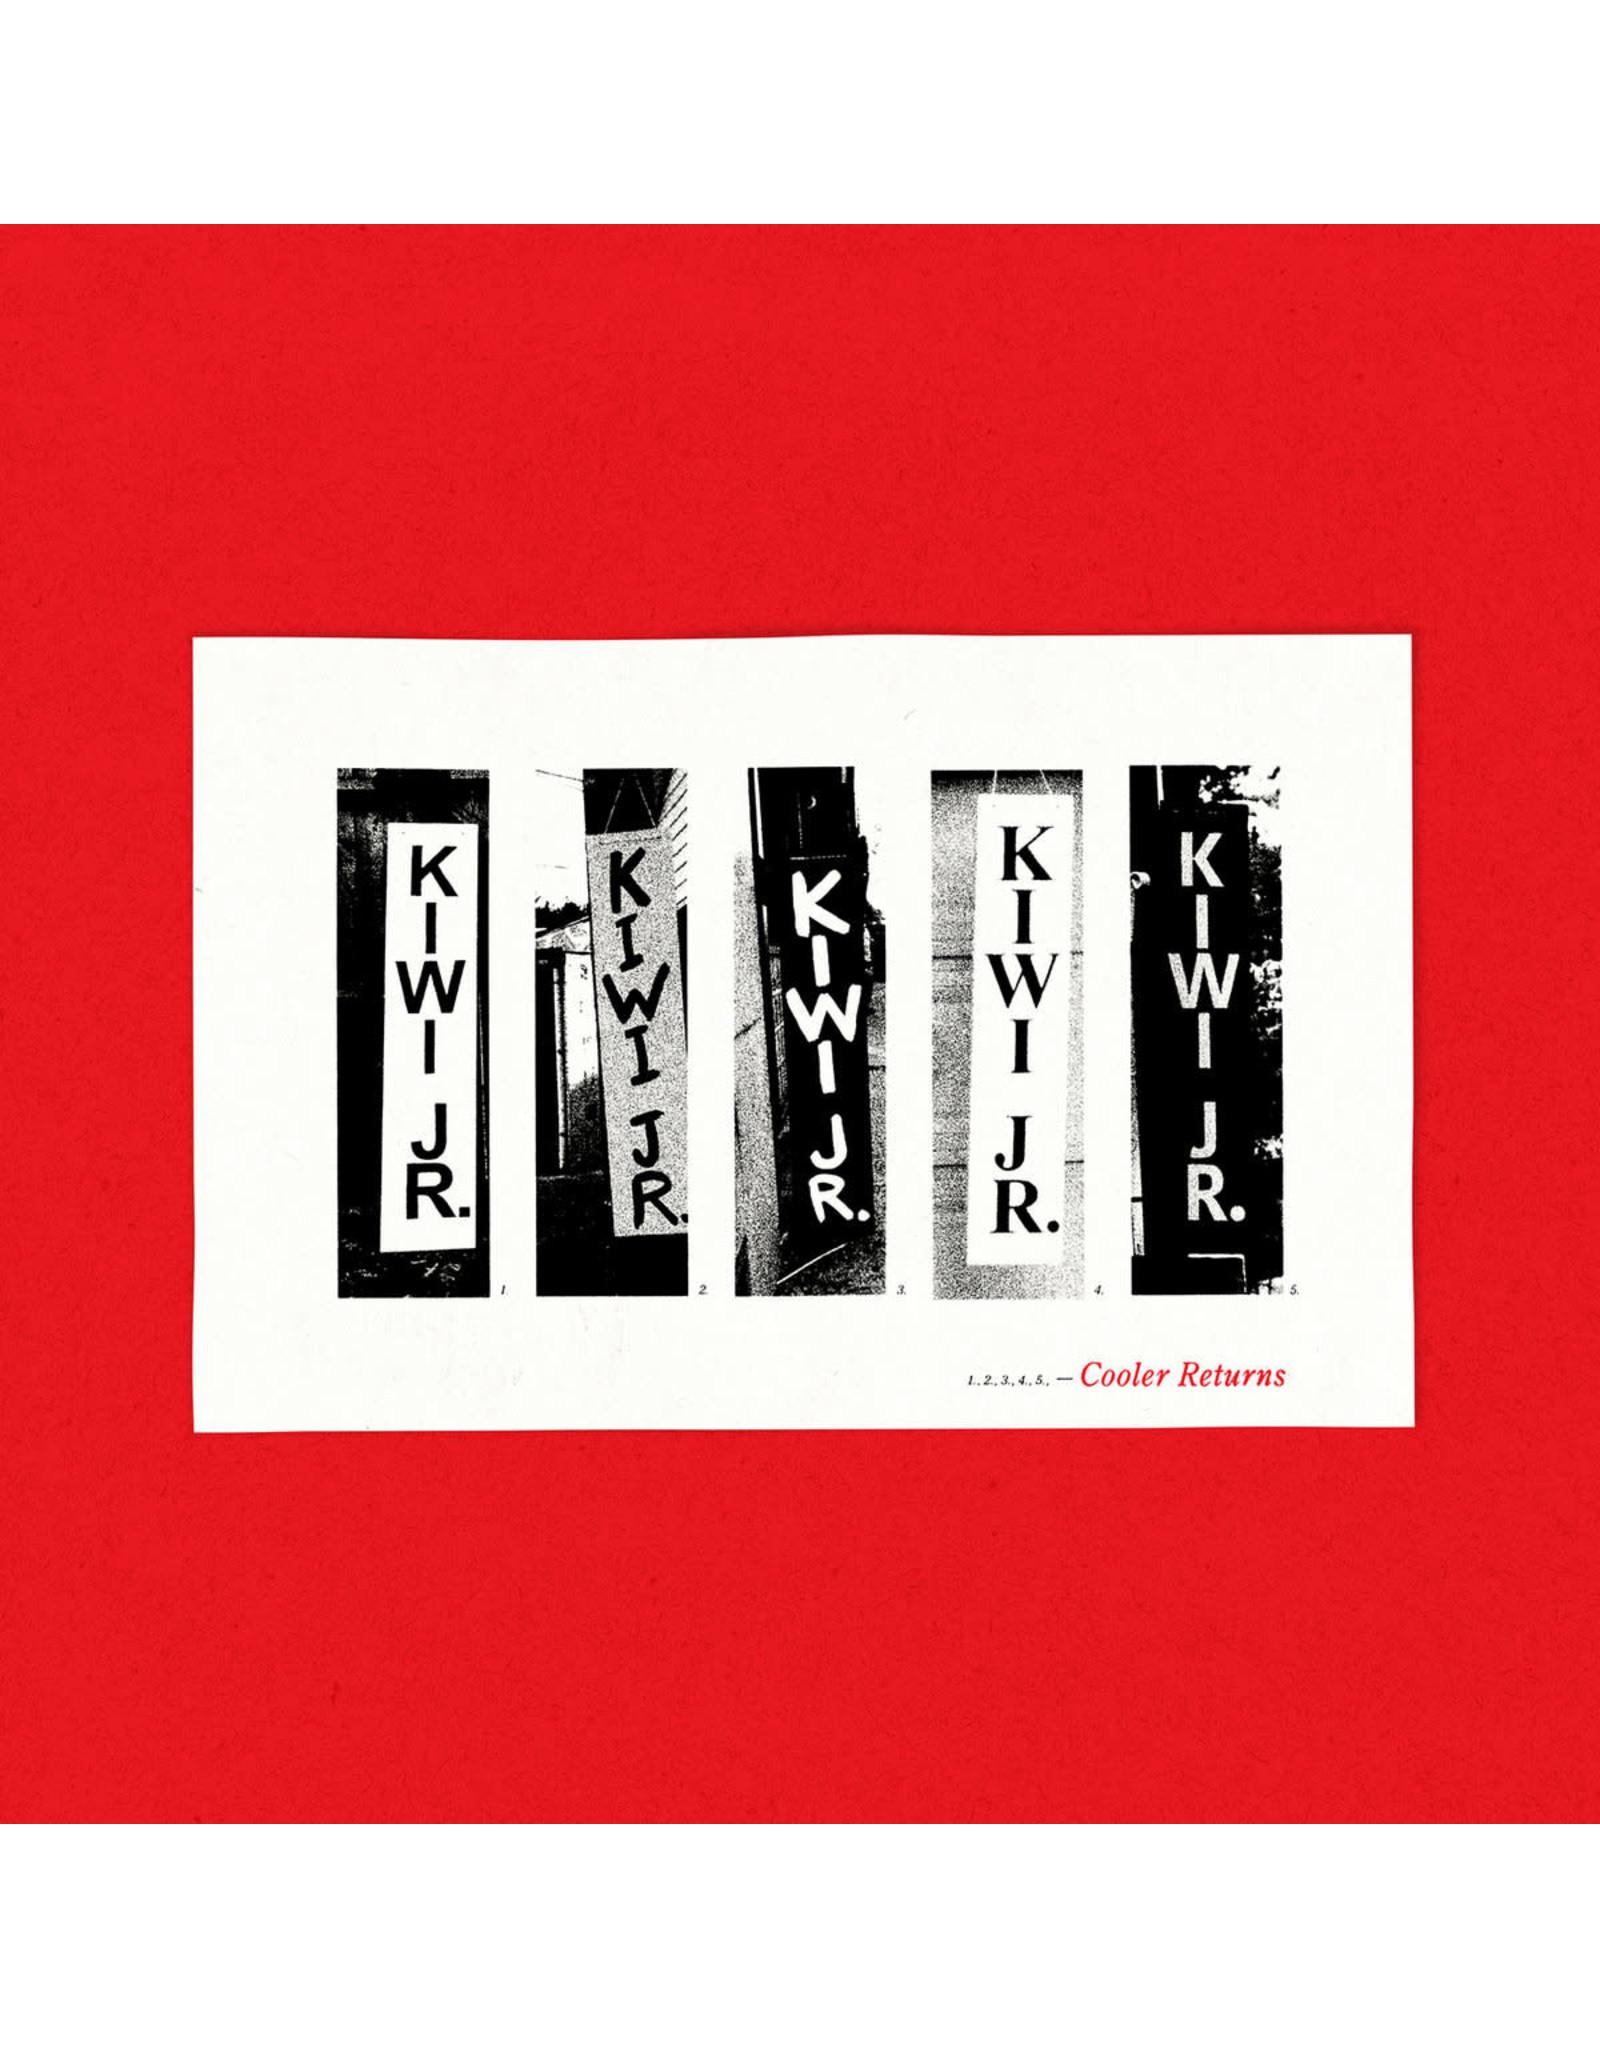 Kiwi Jr. - Cooler Returns LP